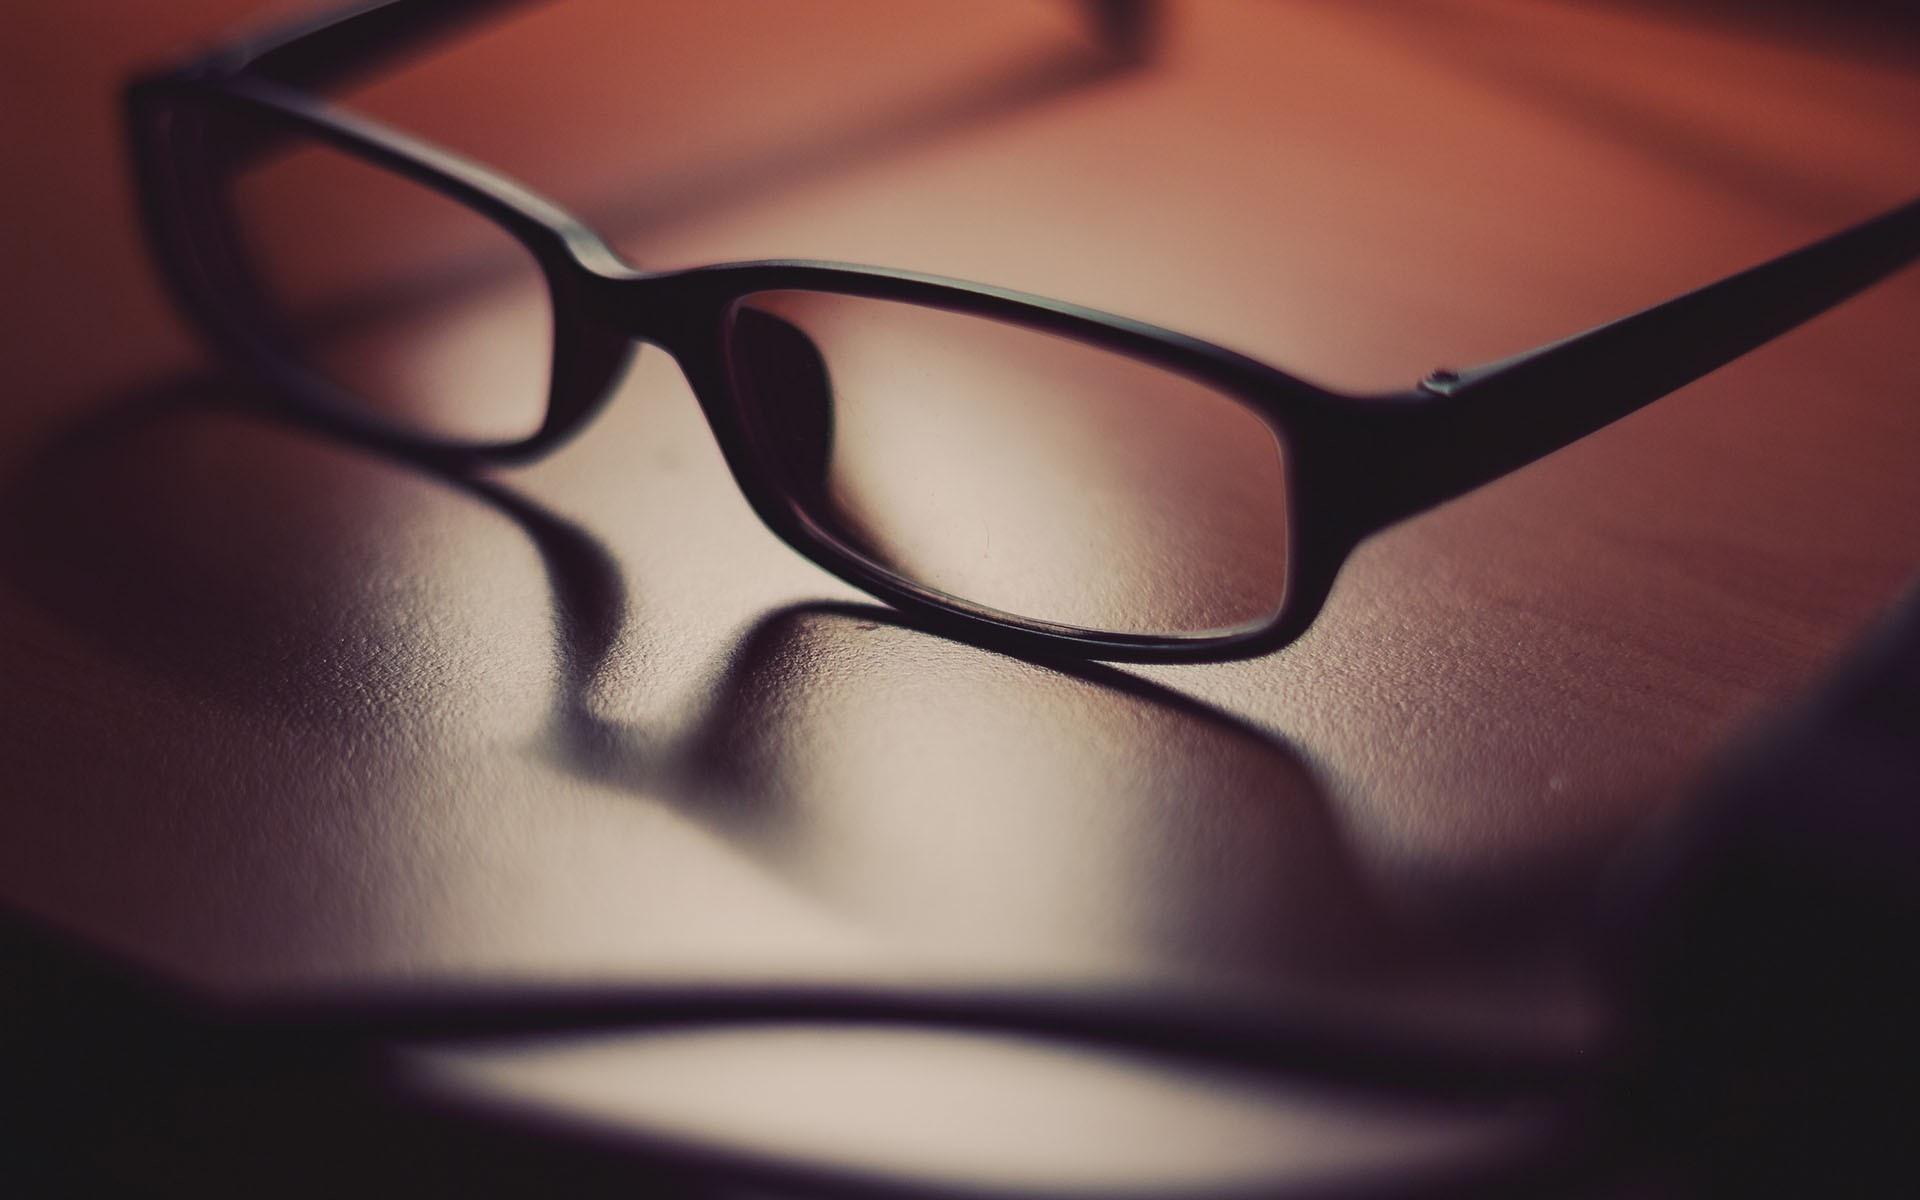 Online eyewear retailer Coastal accepting Bitcoins